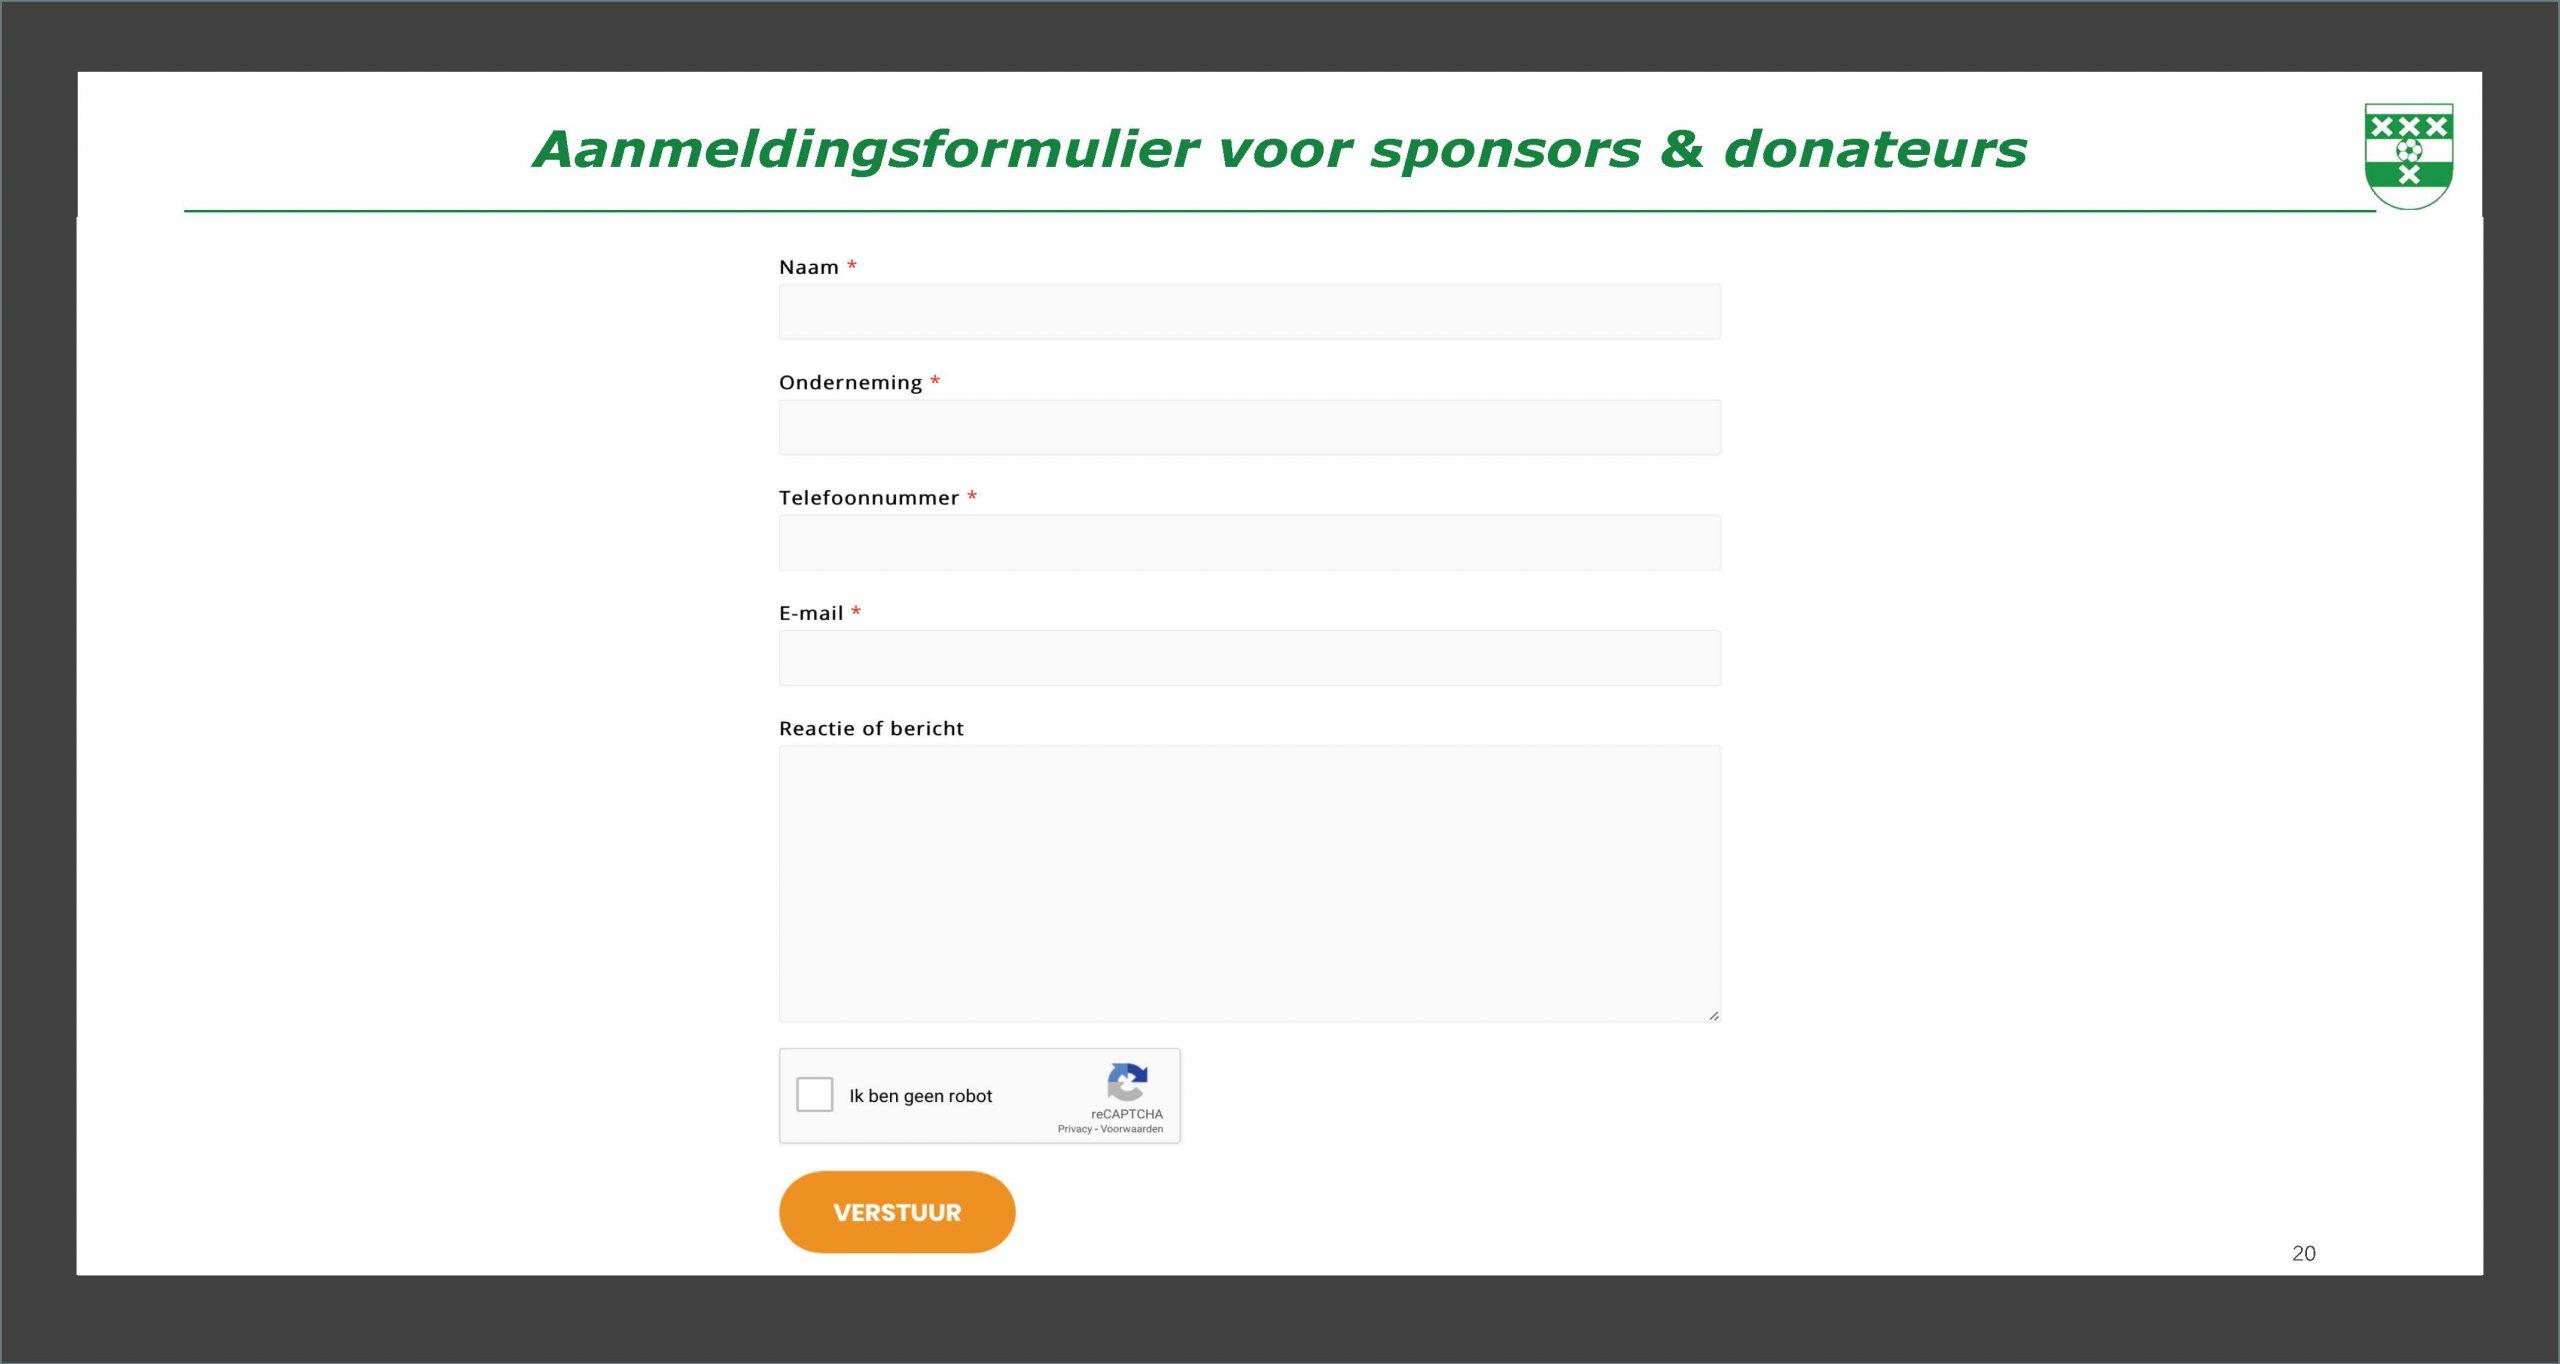 Sponsorplan 2020-2021 DEF_pagina20